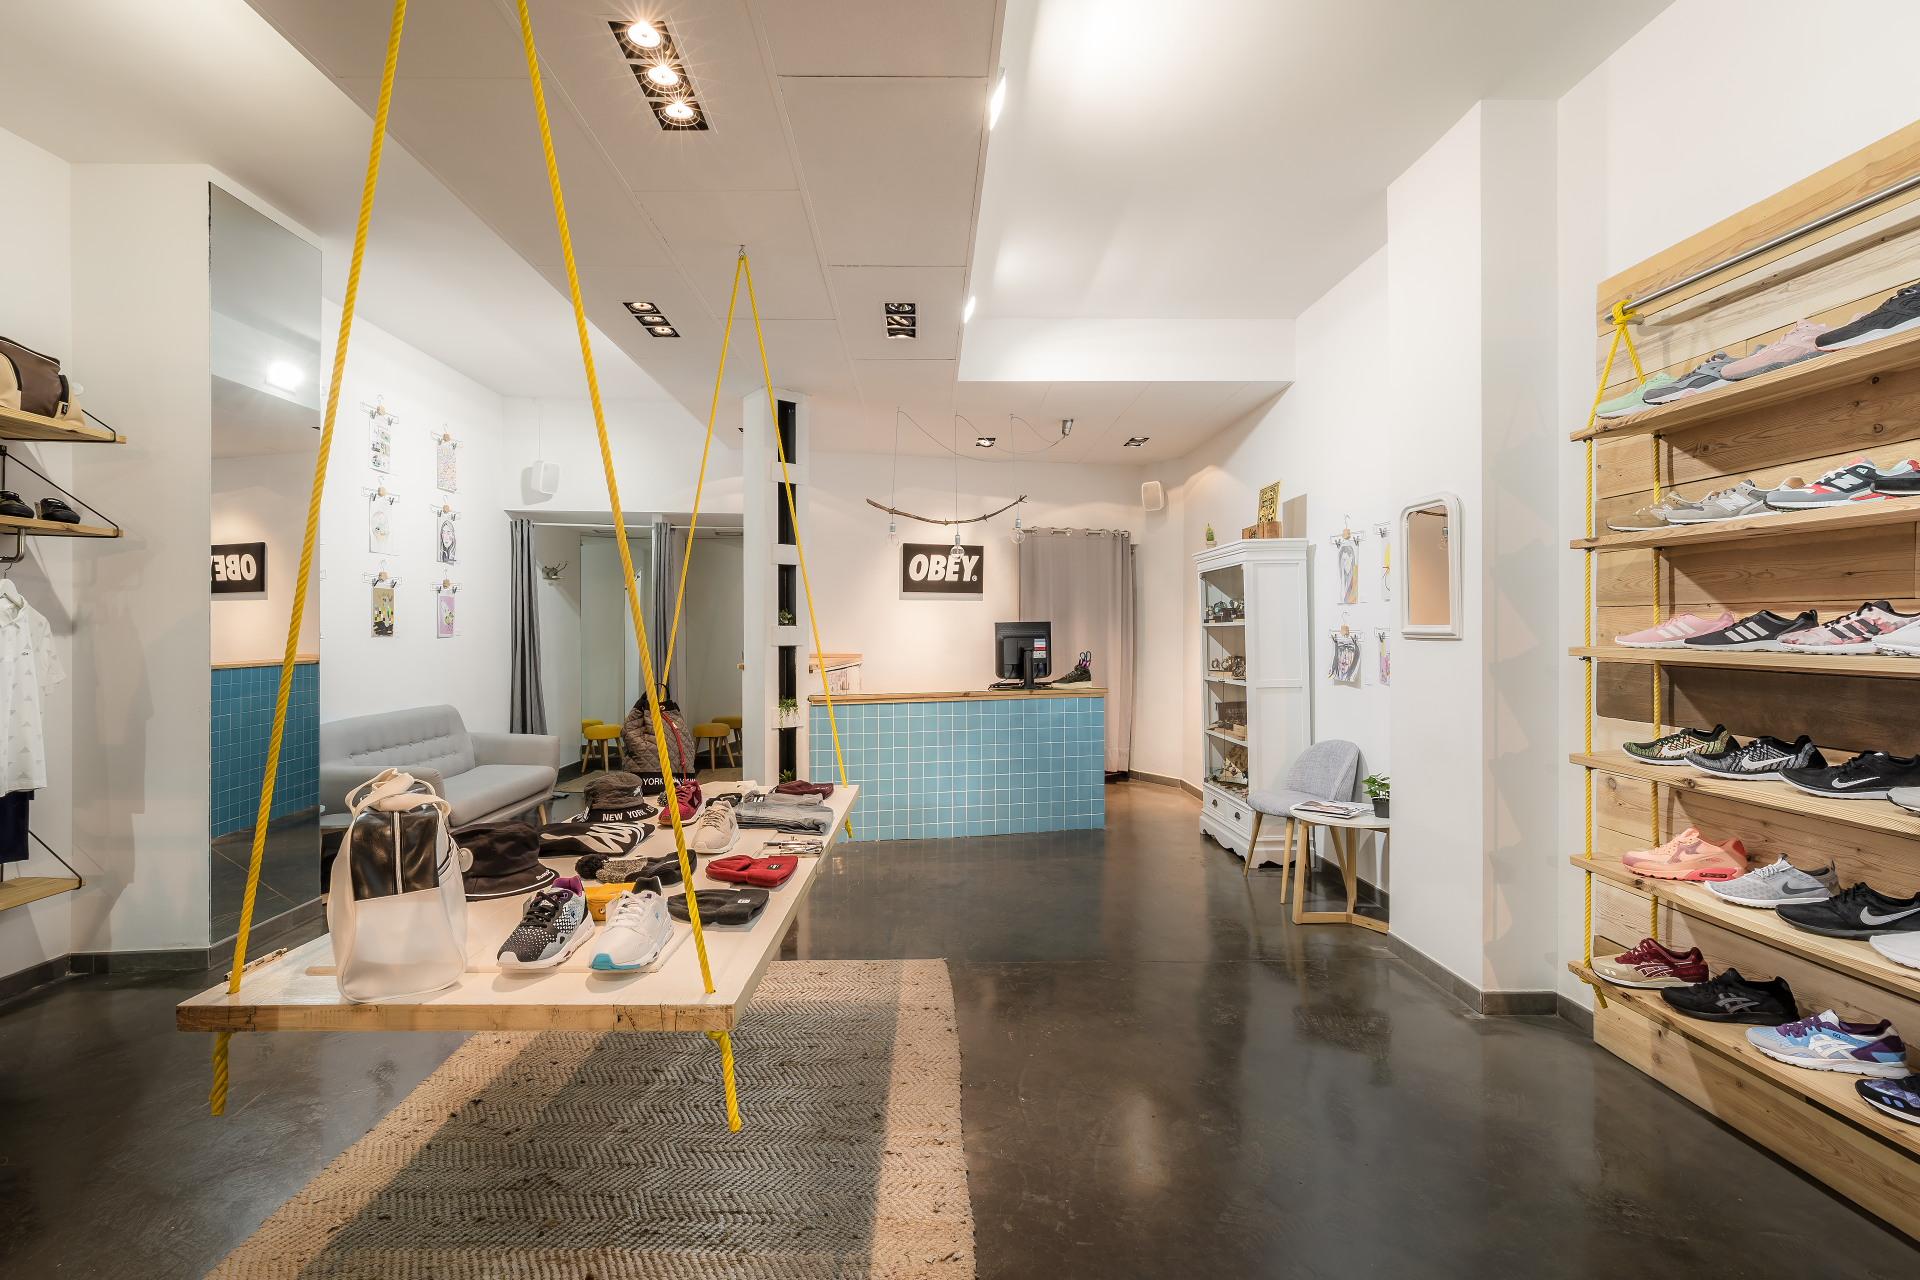 fotografia-arquitectura-interiorismo-valencia-german-cabo-boubau-strap-fortheladies (8)